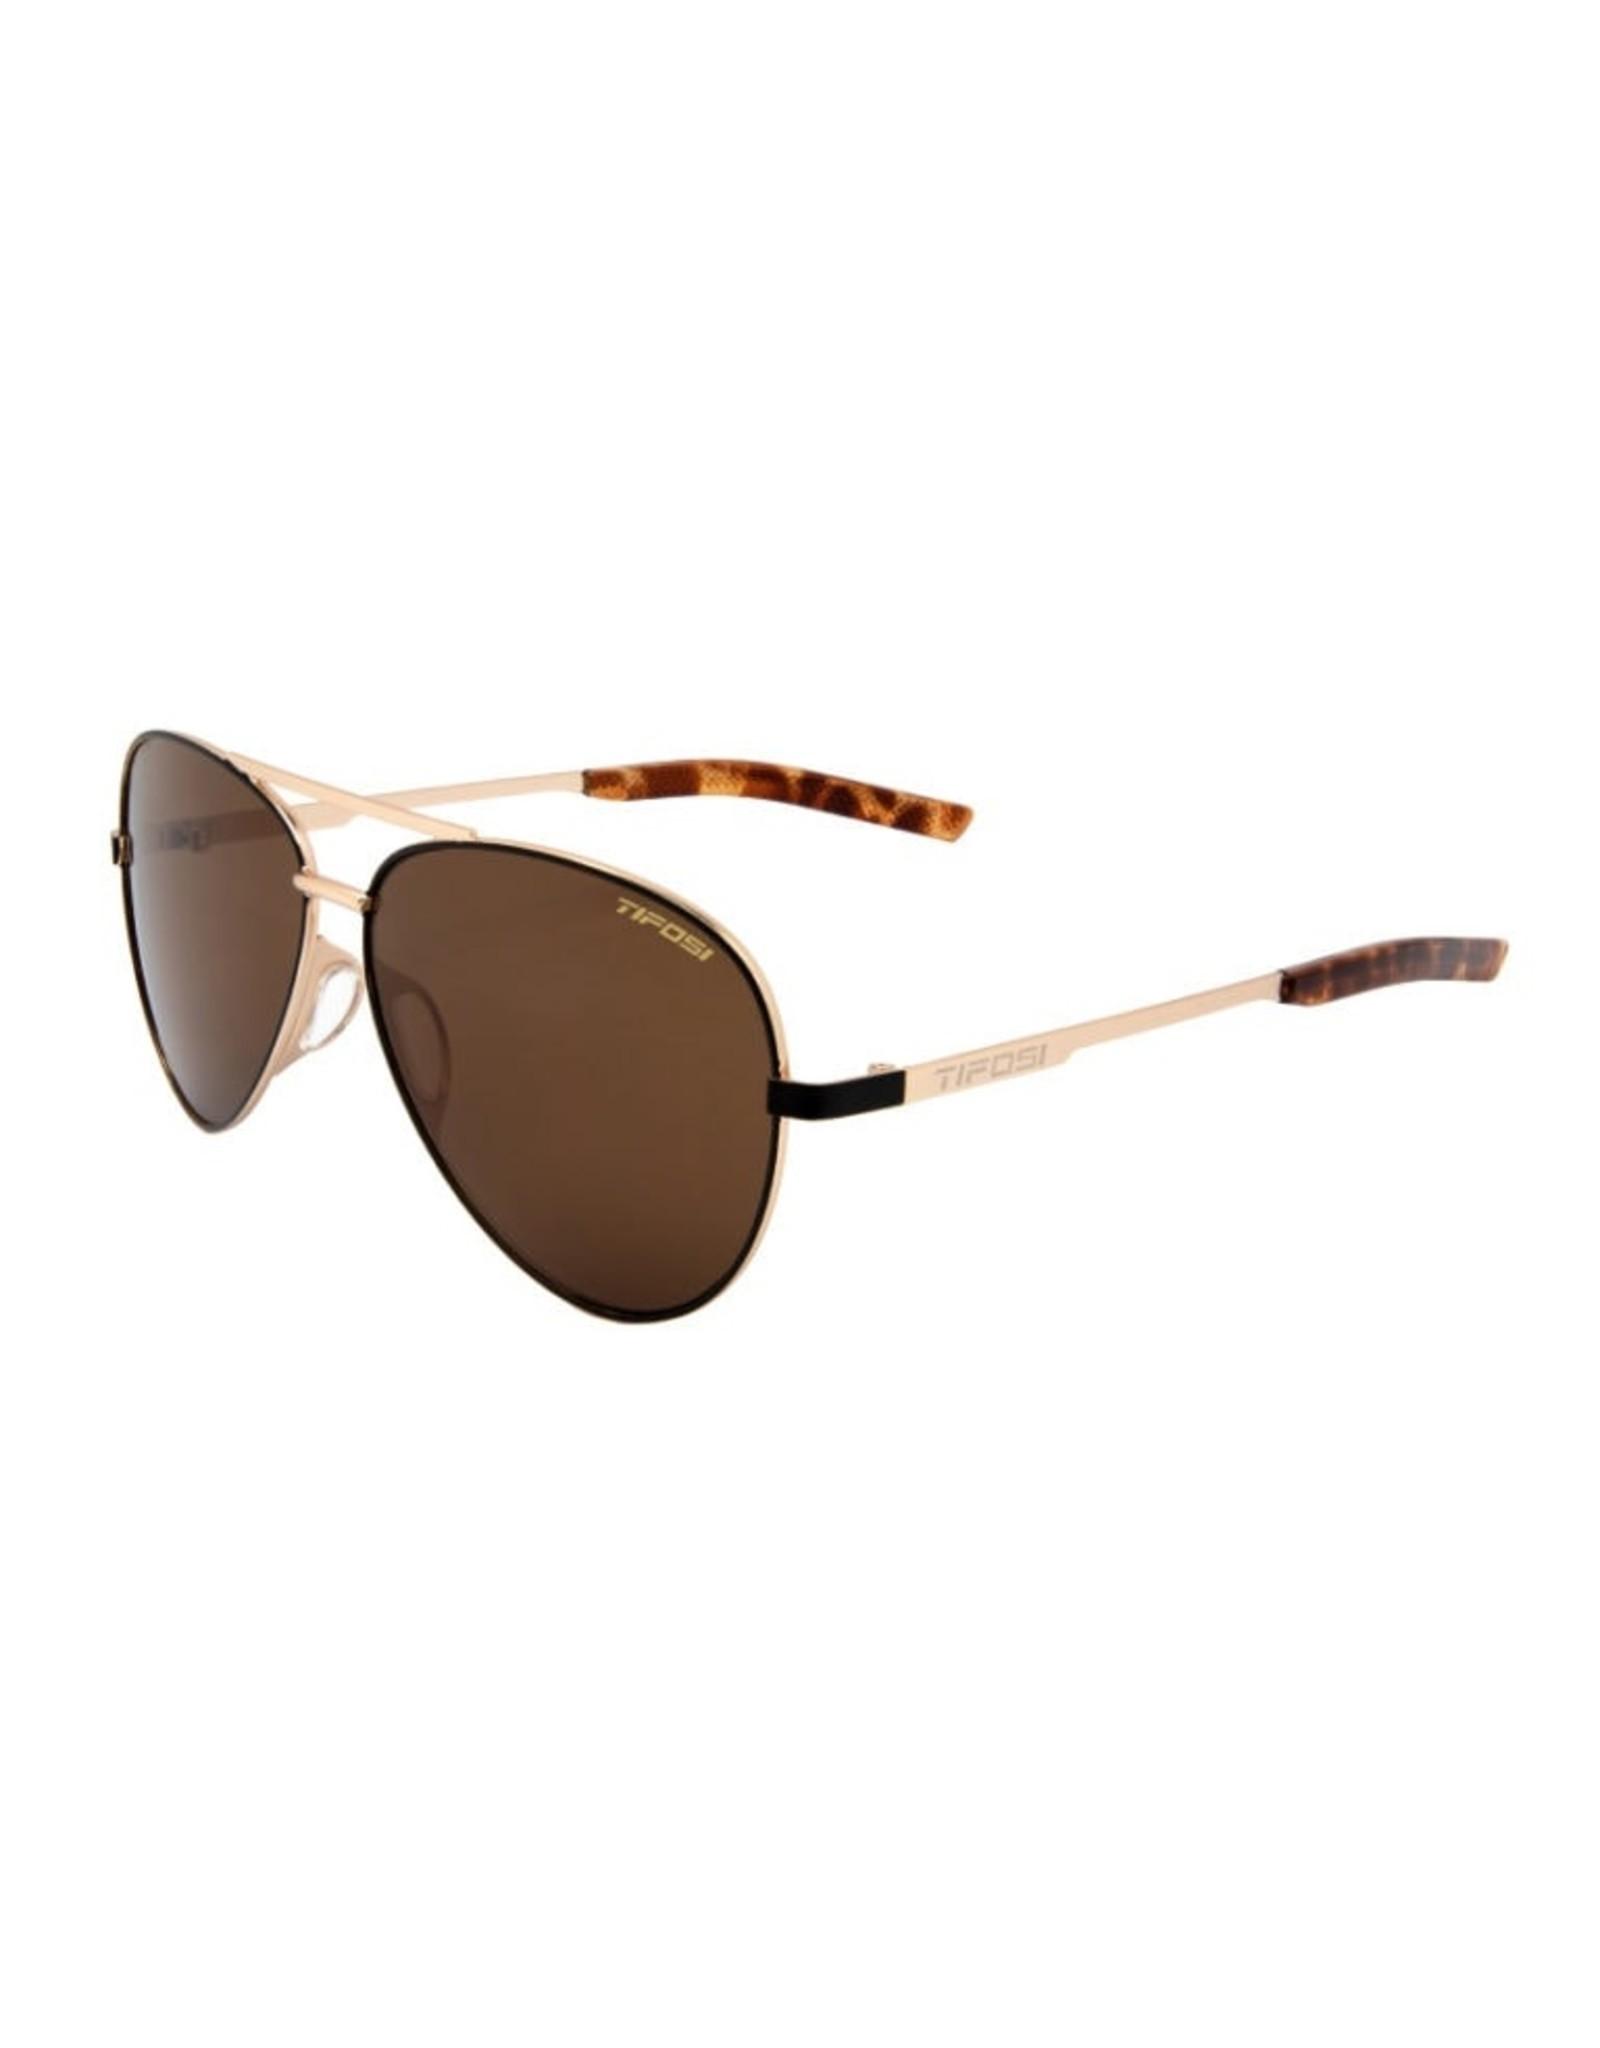 Tifosi Optics Shwae, Midnight Gold Single Lens Sunglasses - Brown